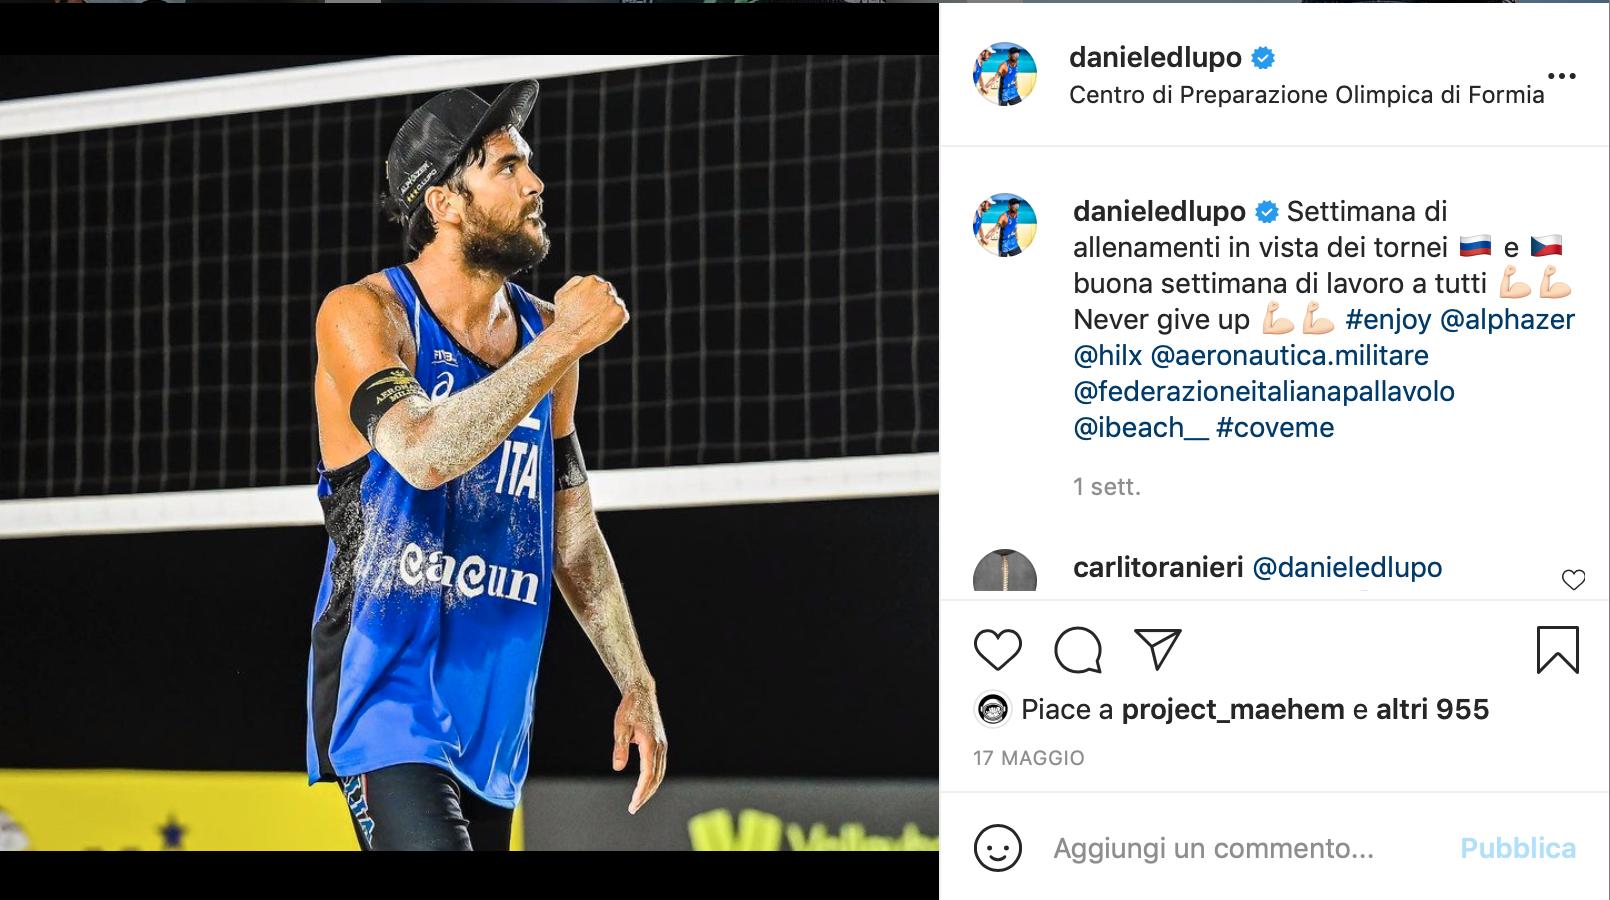 Daniele Lupo Instagram